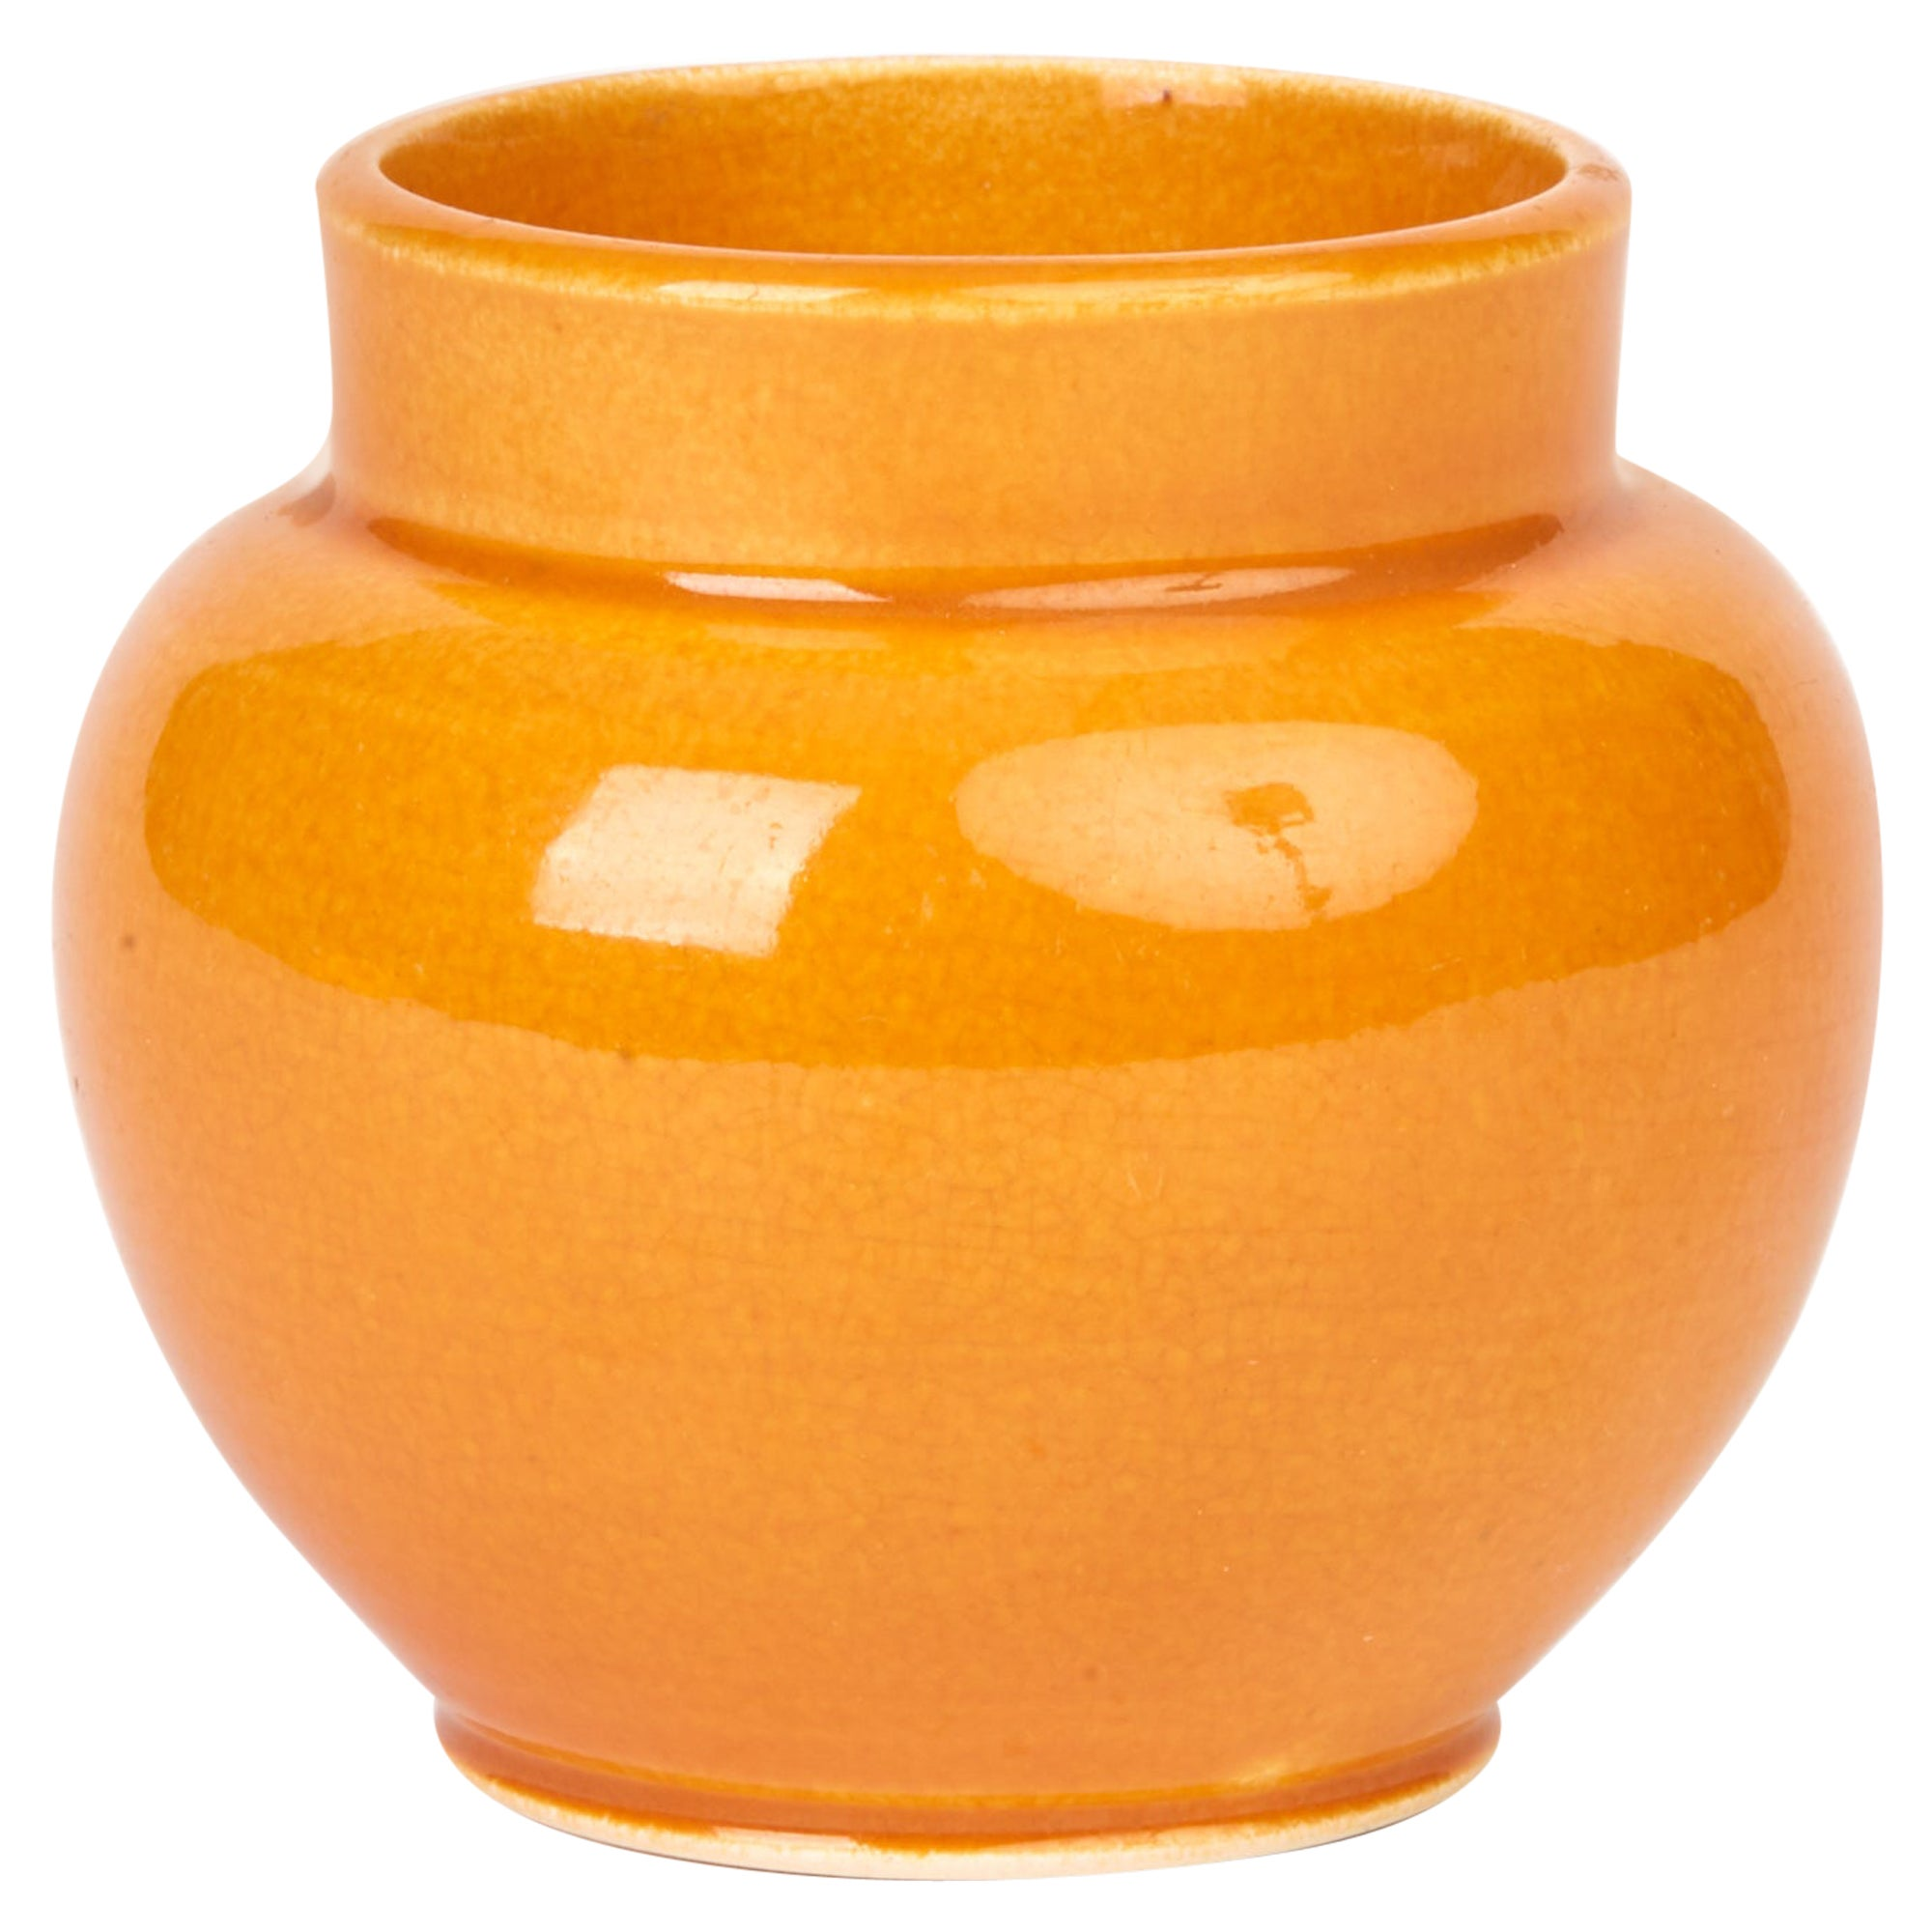 Samuel Lear Rare Arts & Crafts Miniature Art Pottery Vase, circa 1890